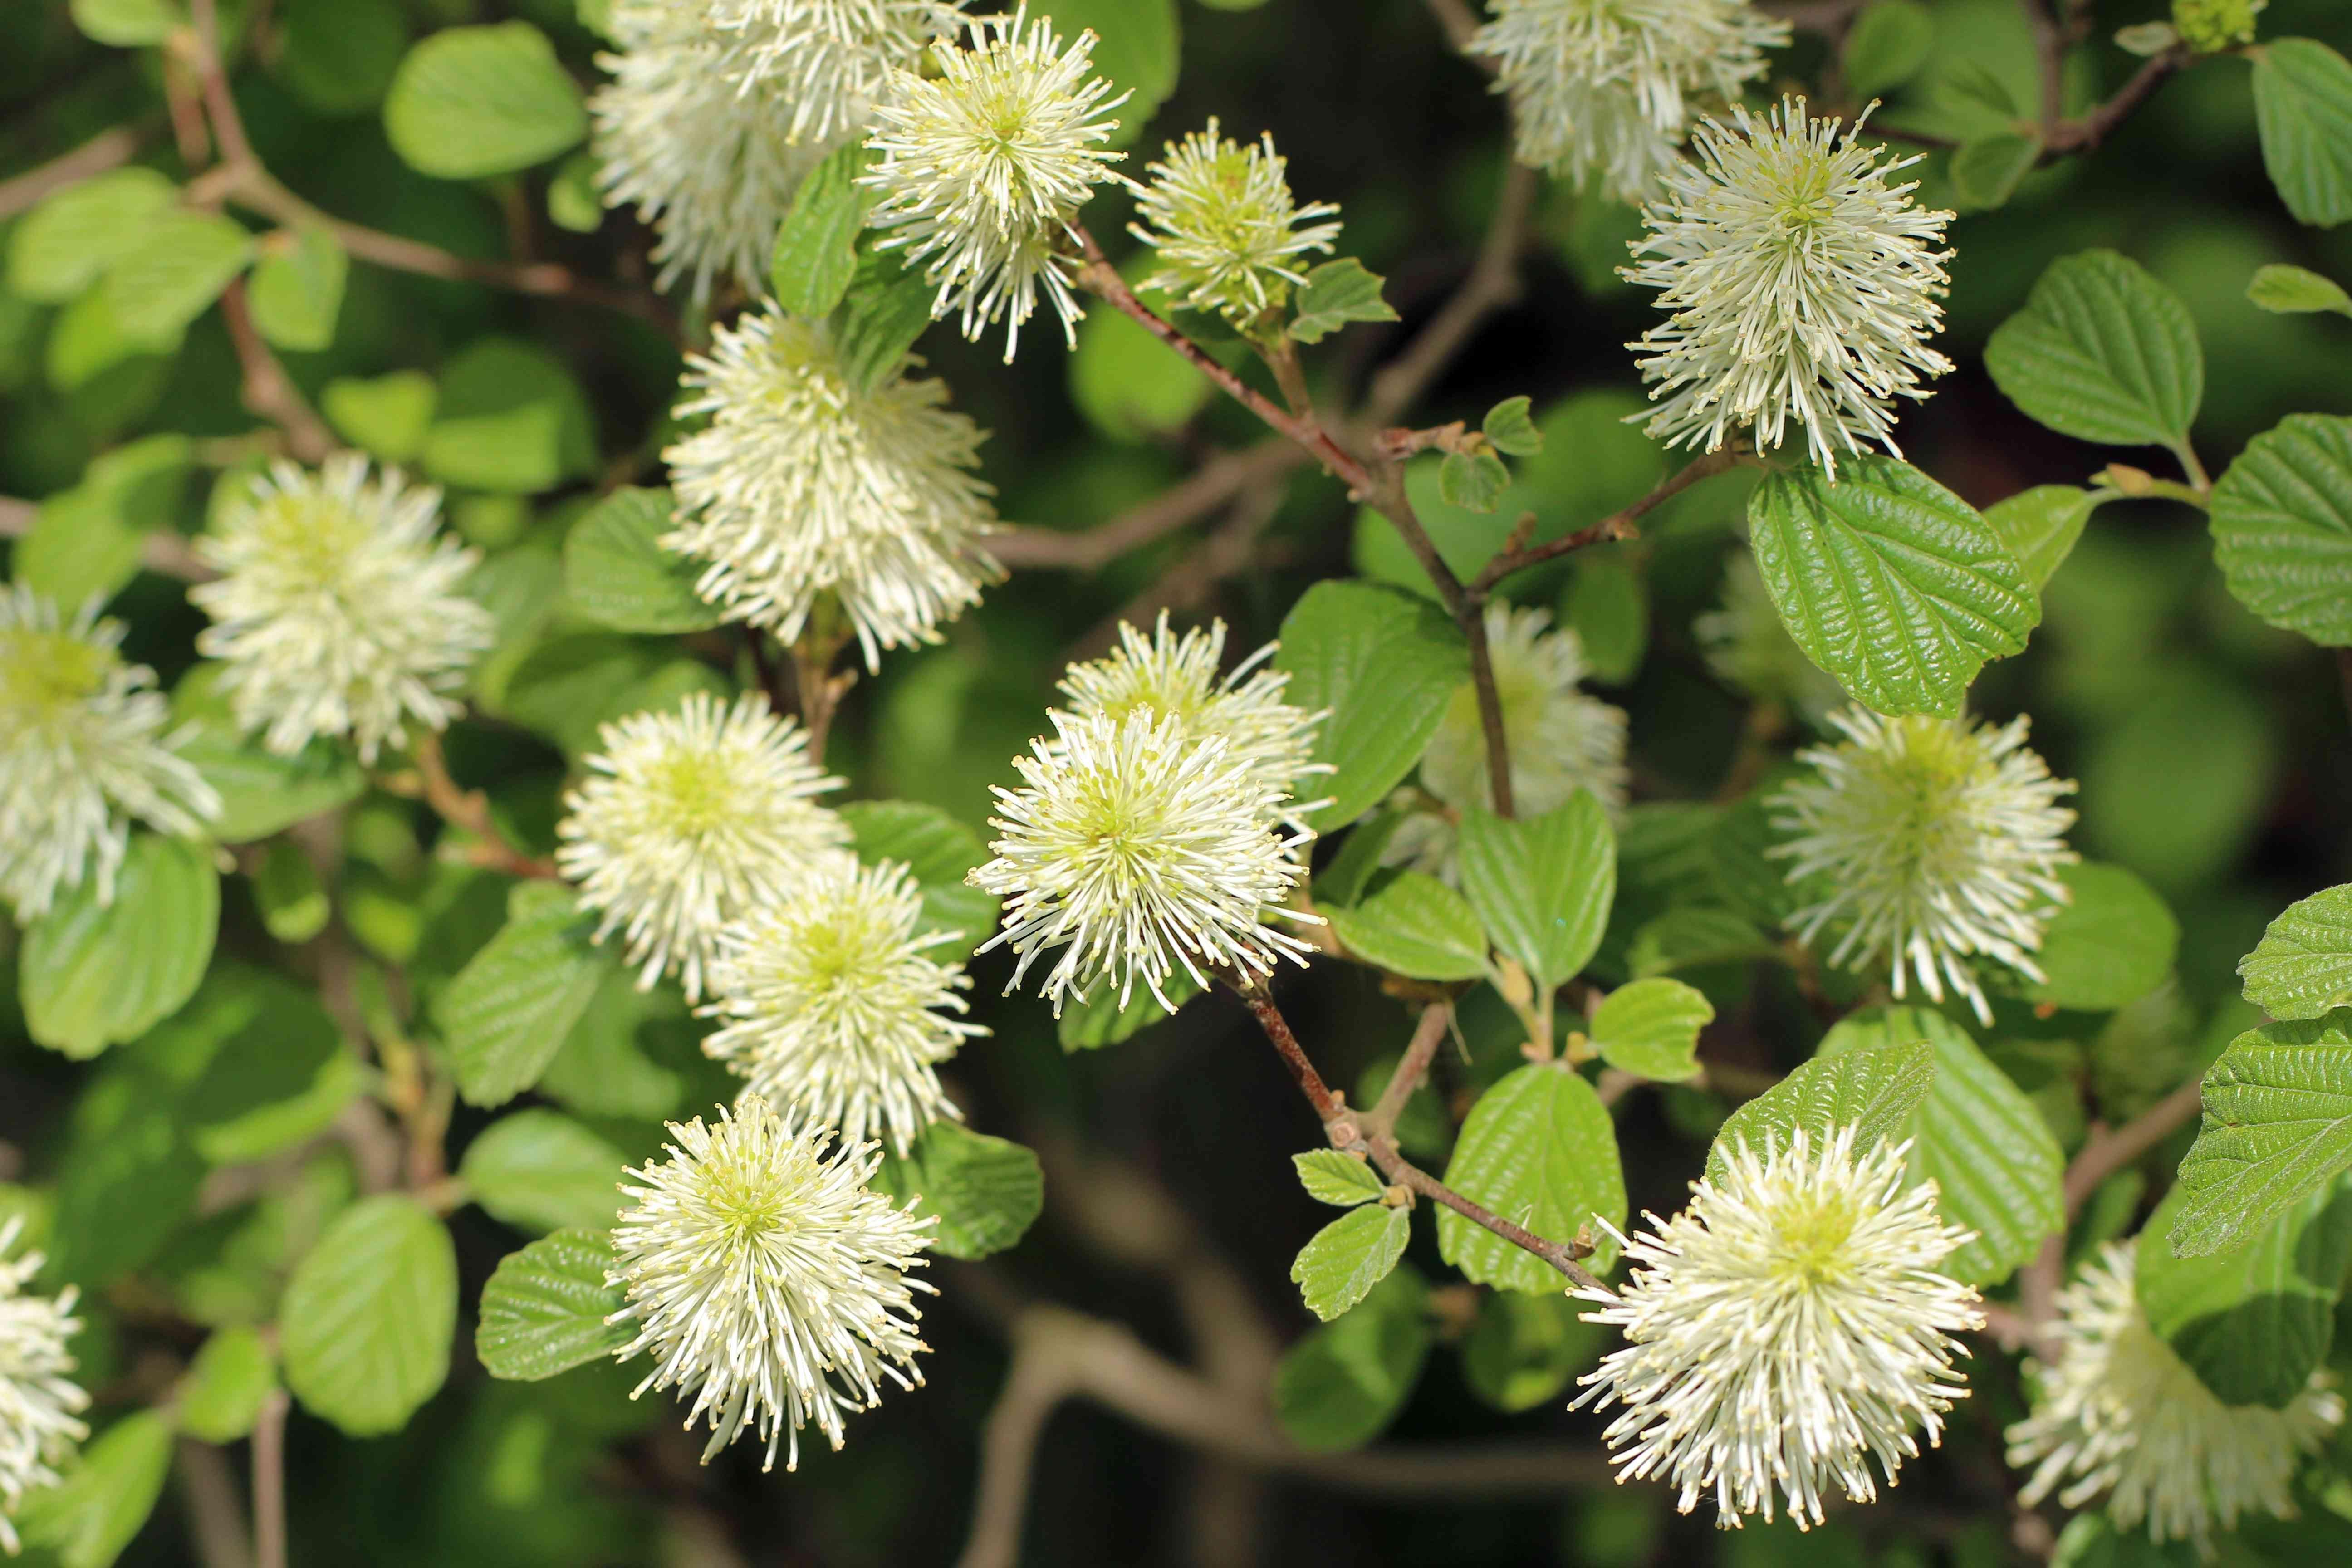 Fothergilla major bush